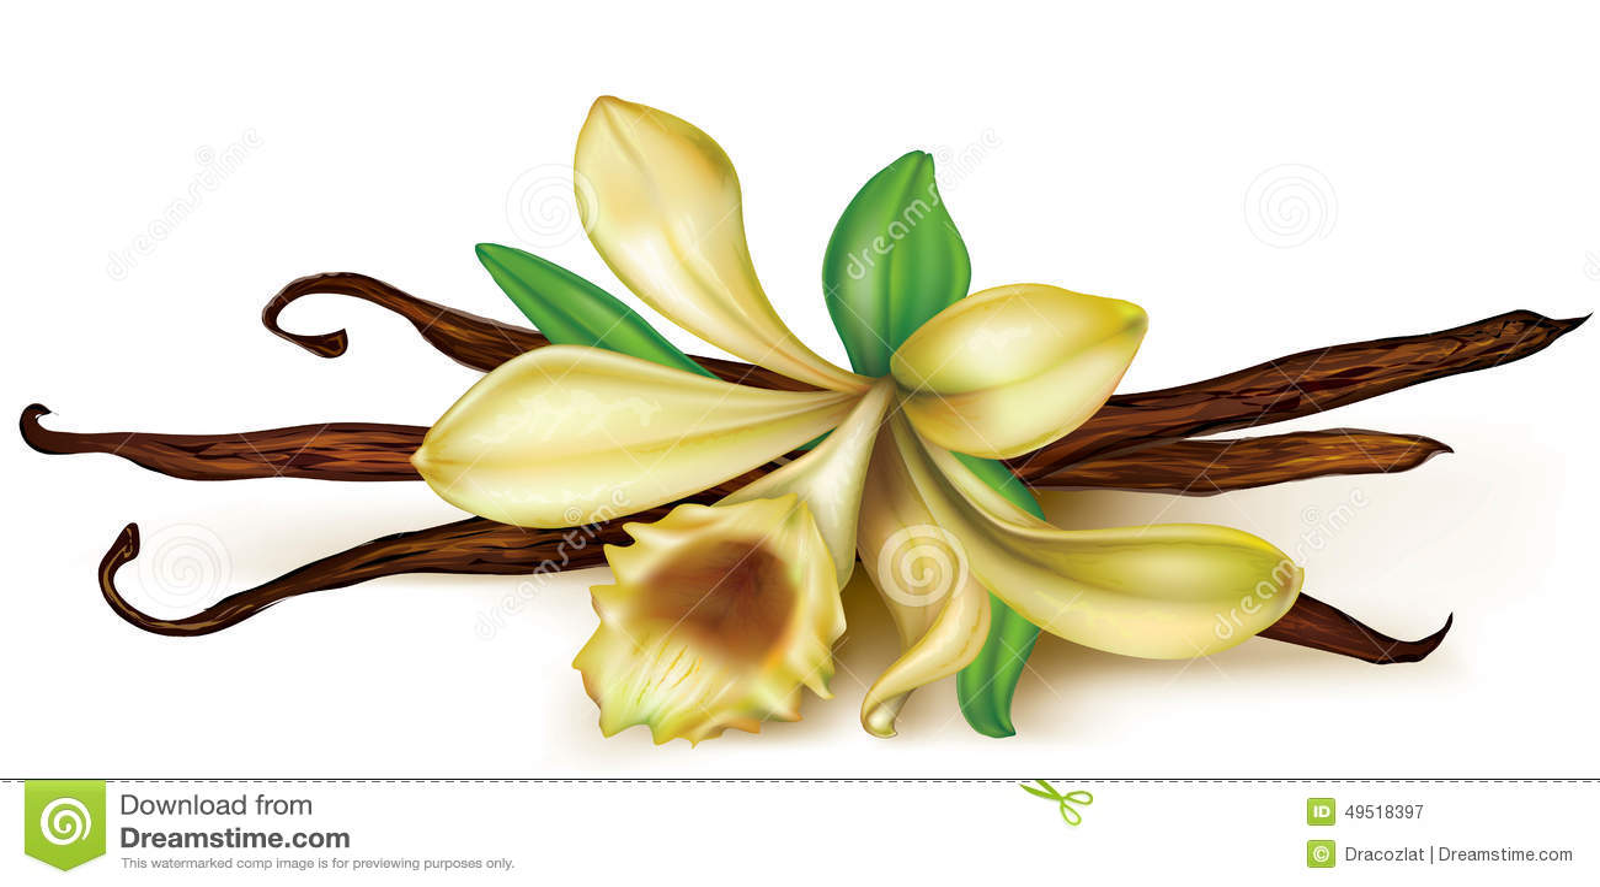 Vanilla Orchid Stock Vector. Illustration Of Floral, Asian